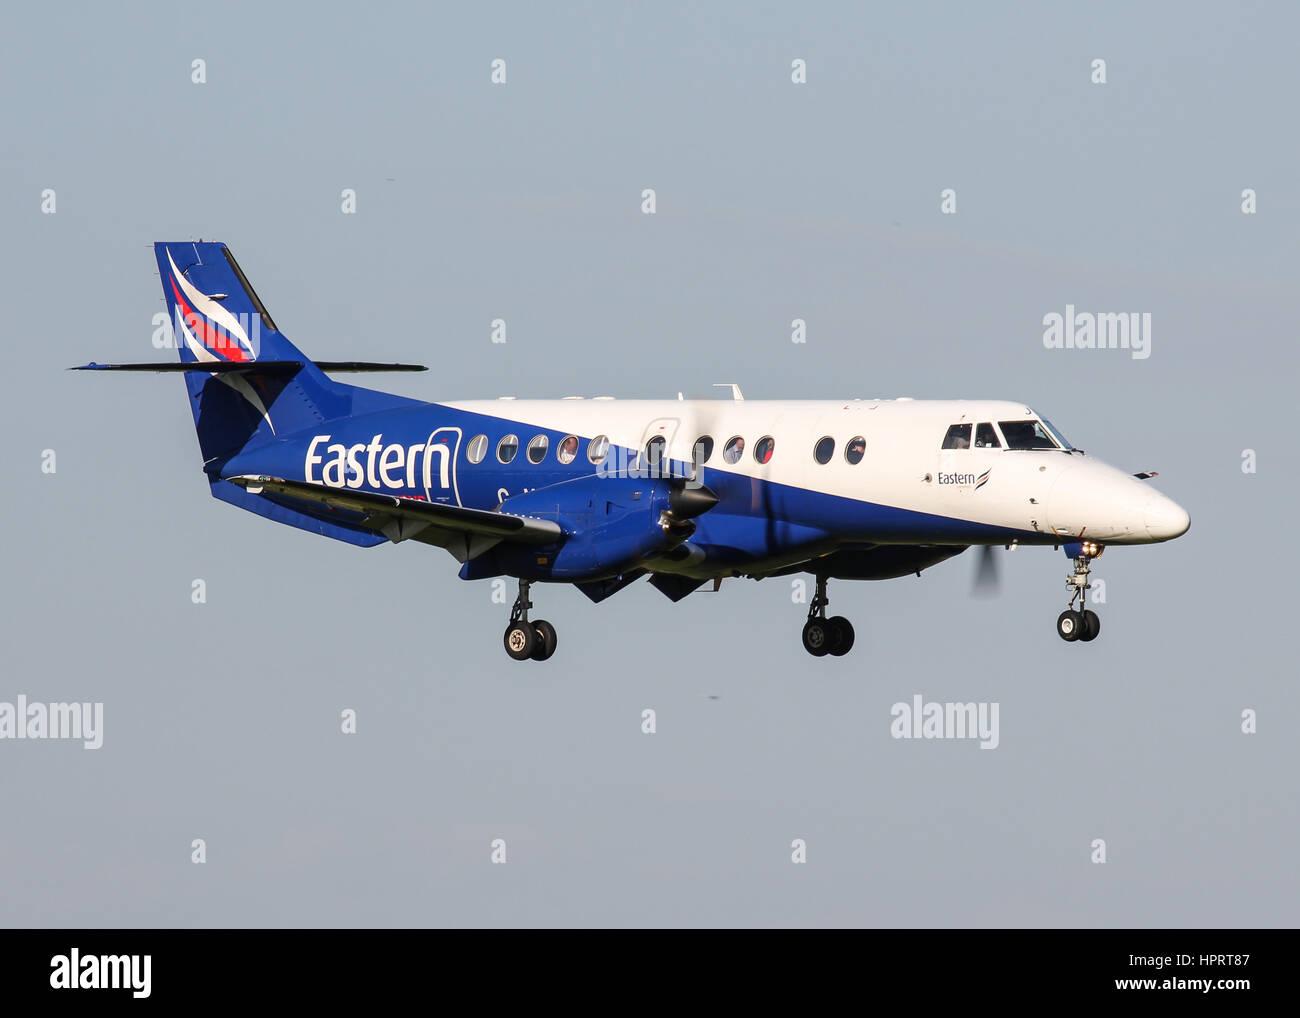 Eastern Airways BAe Jetstream 41 G-MAJL landing at Southampton Airport - Stock Image